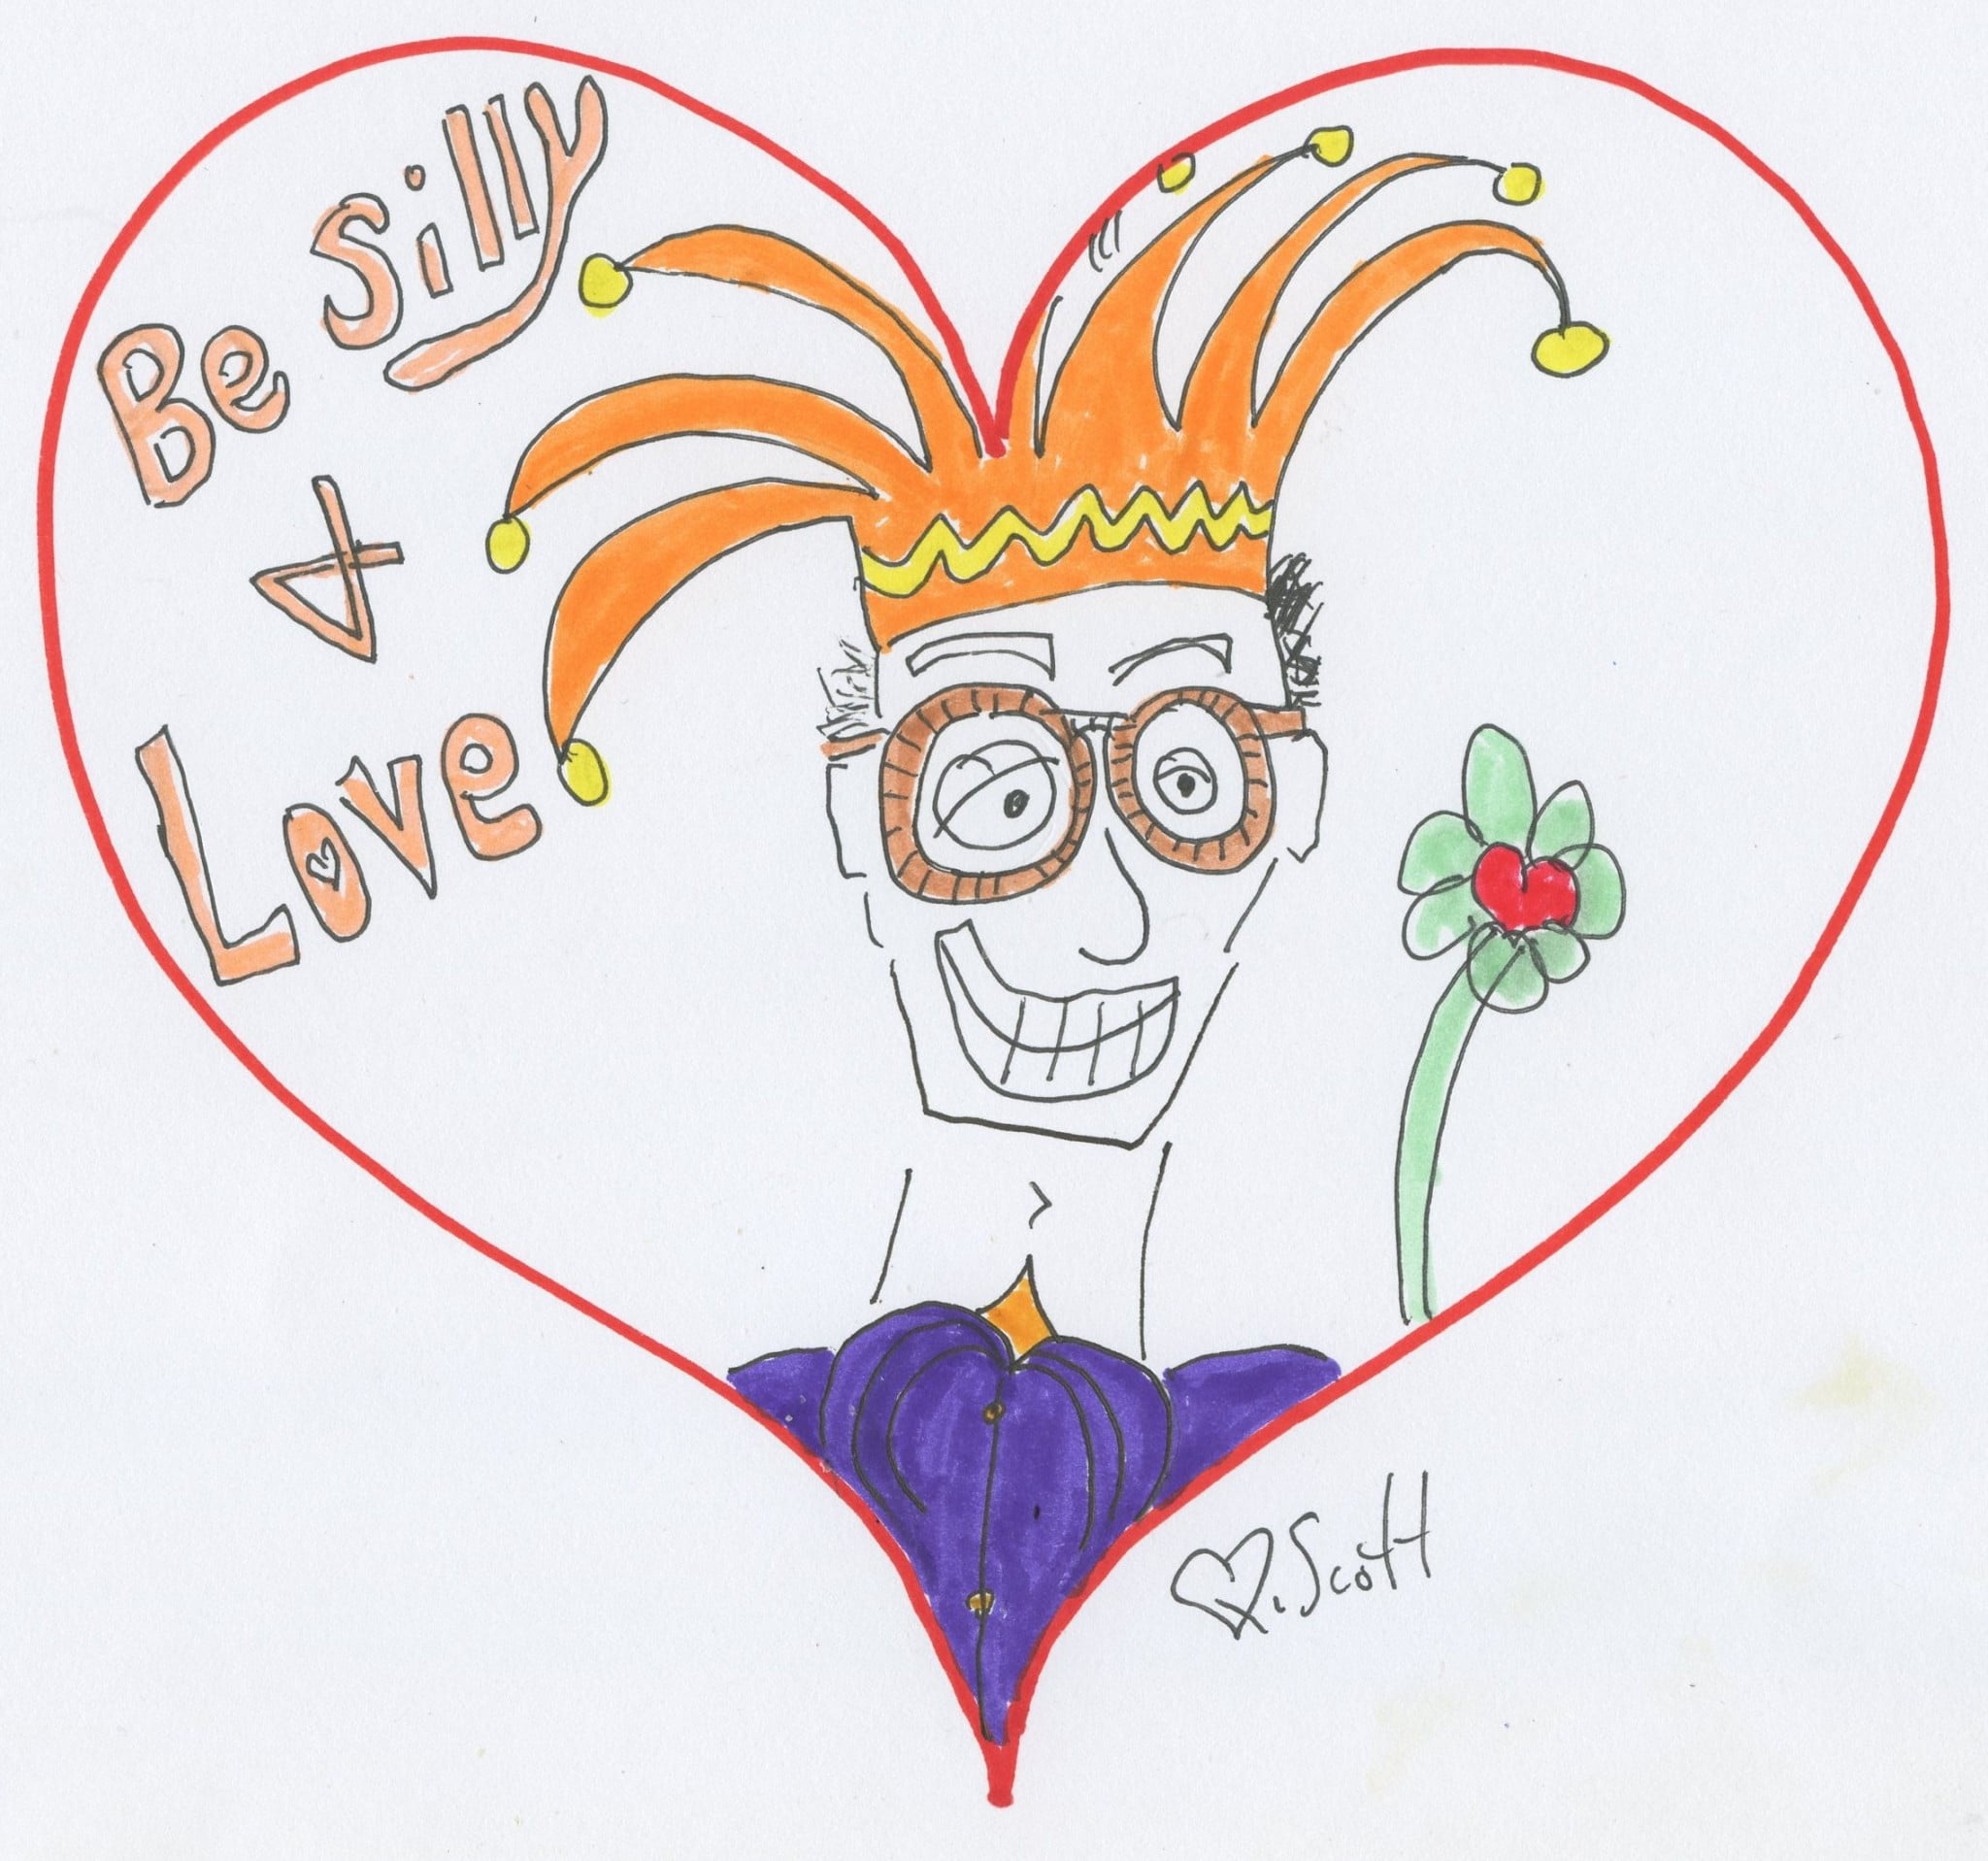 love, silly, heart